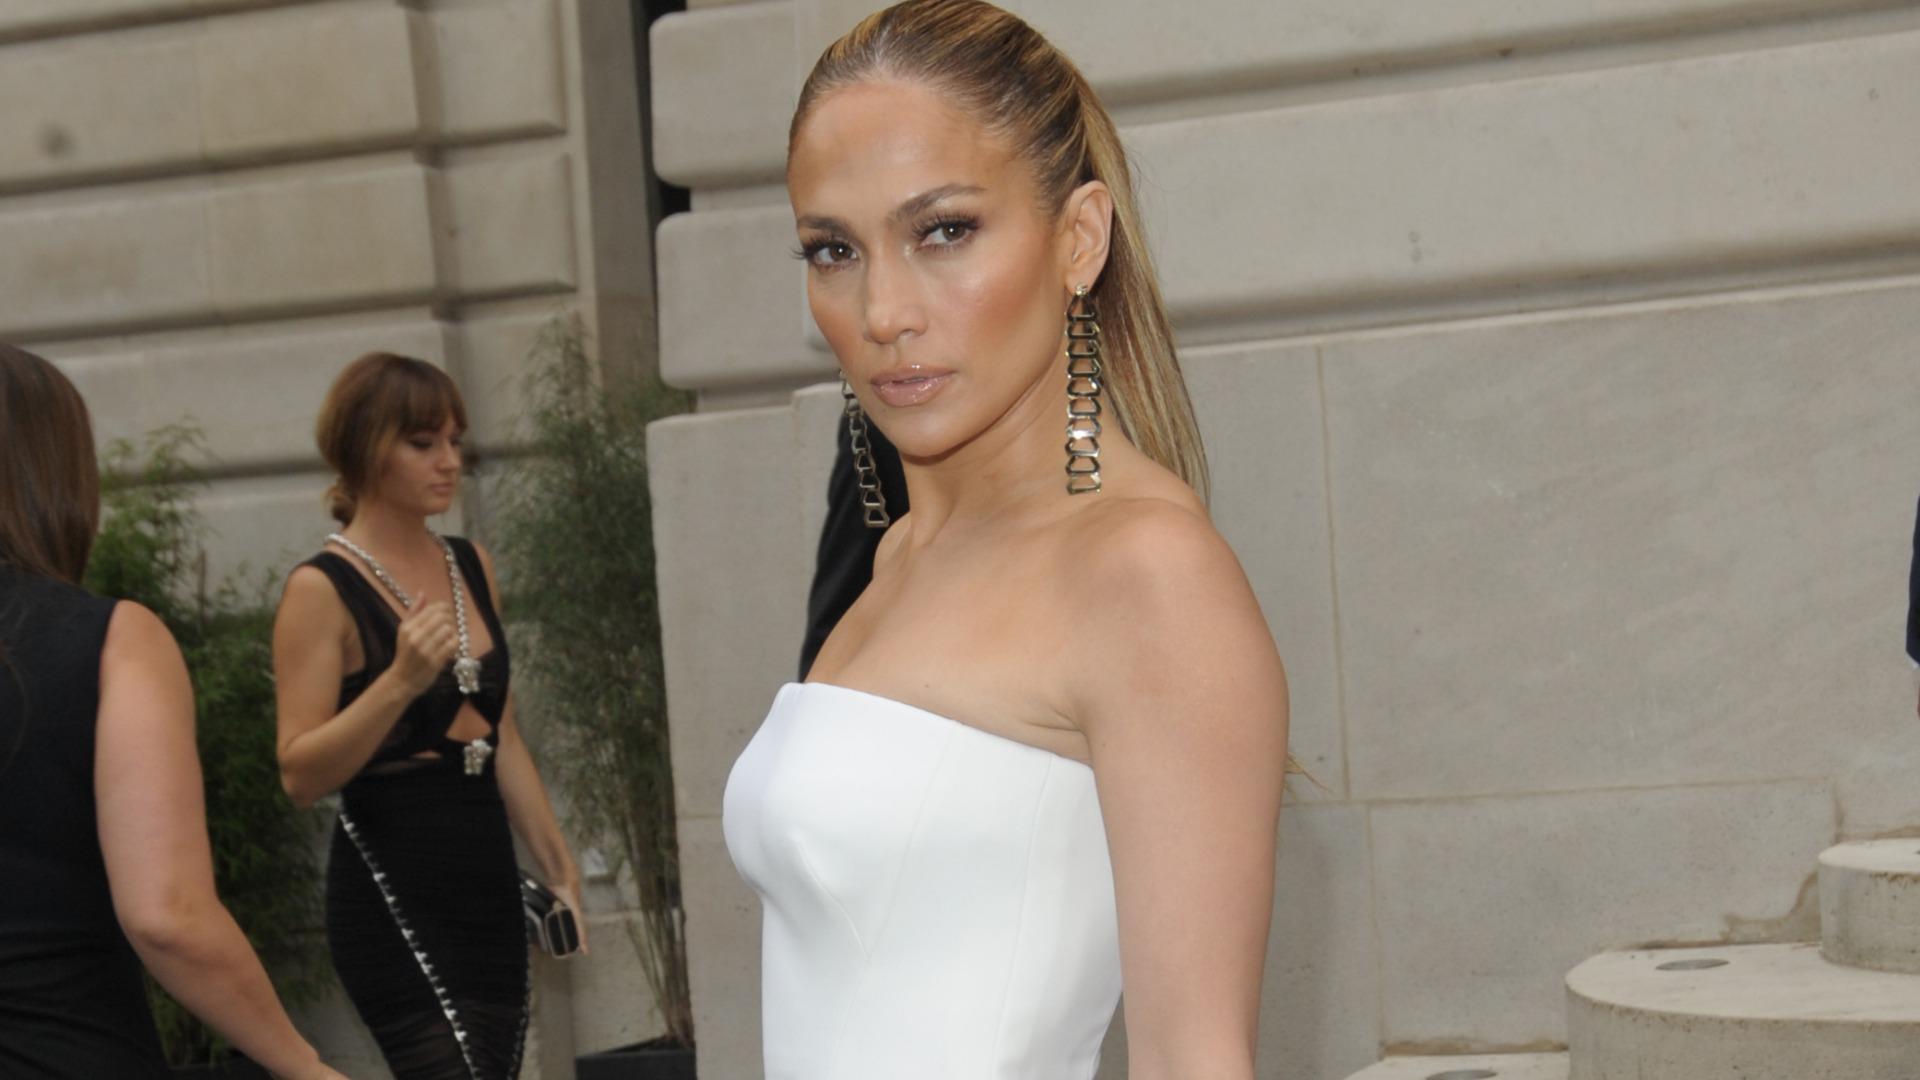 Jennifer Lopez insists she doesn't whore around (VIDEO)